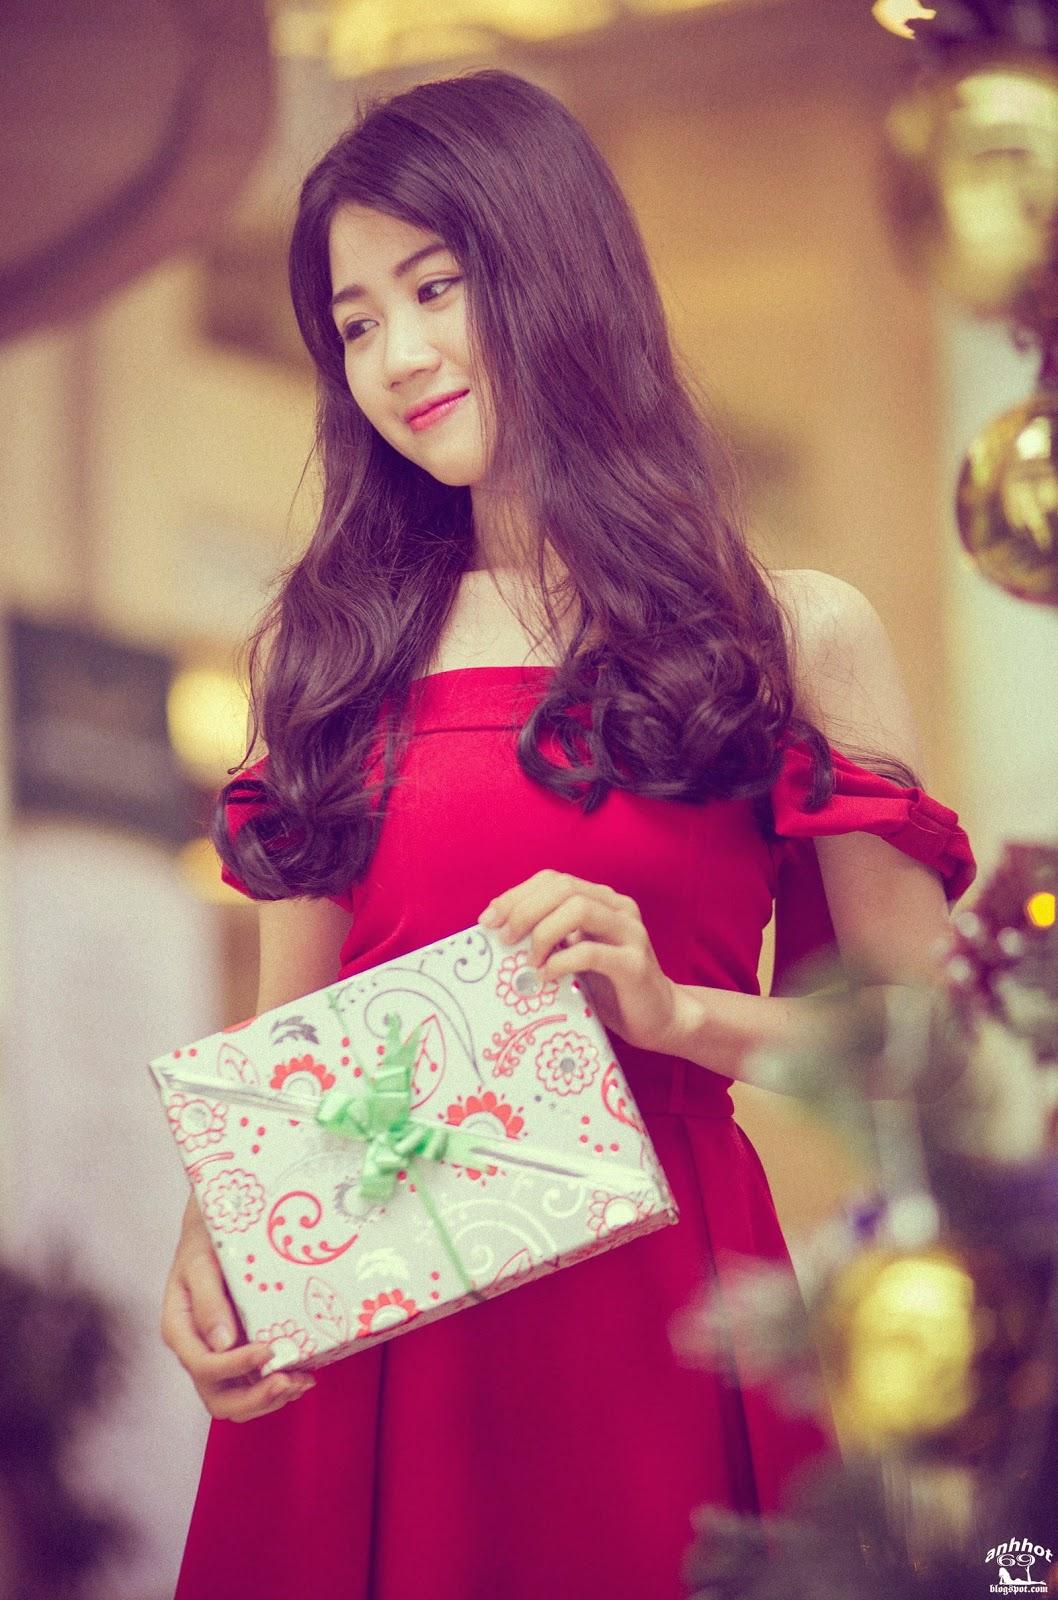 merry-christmas_1412251540_05